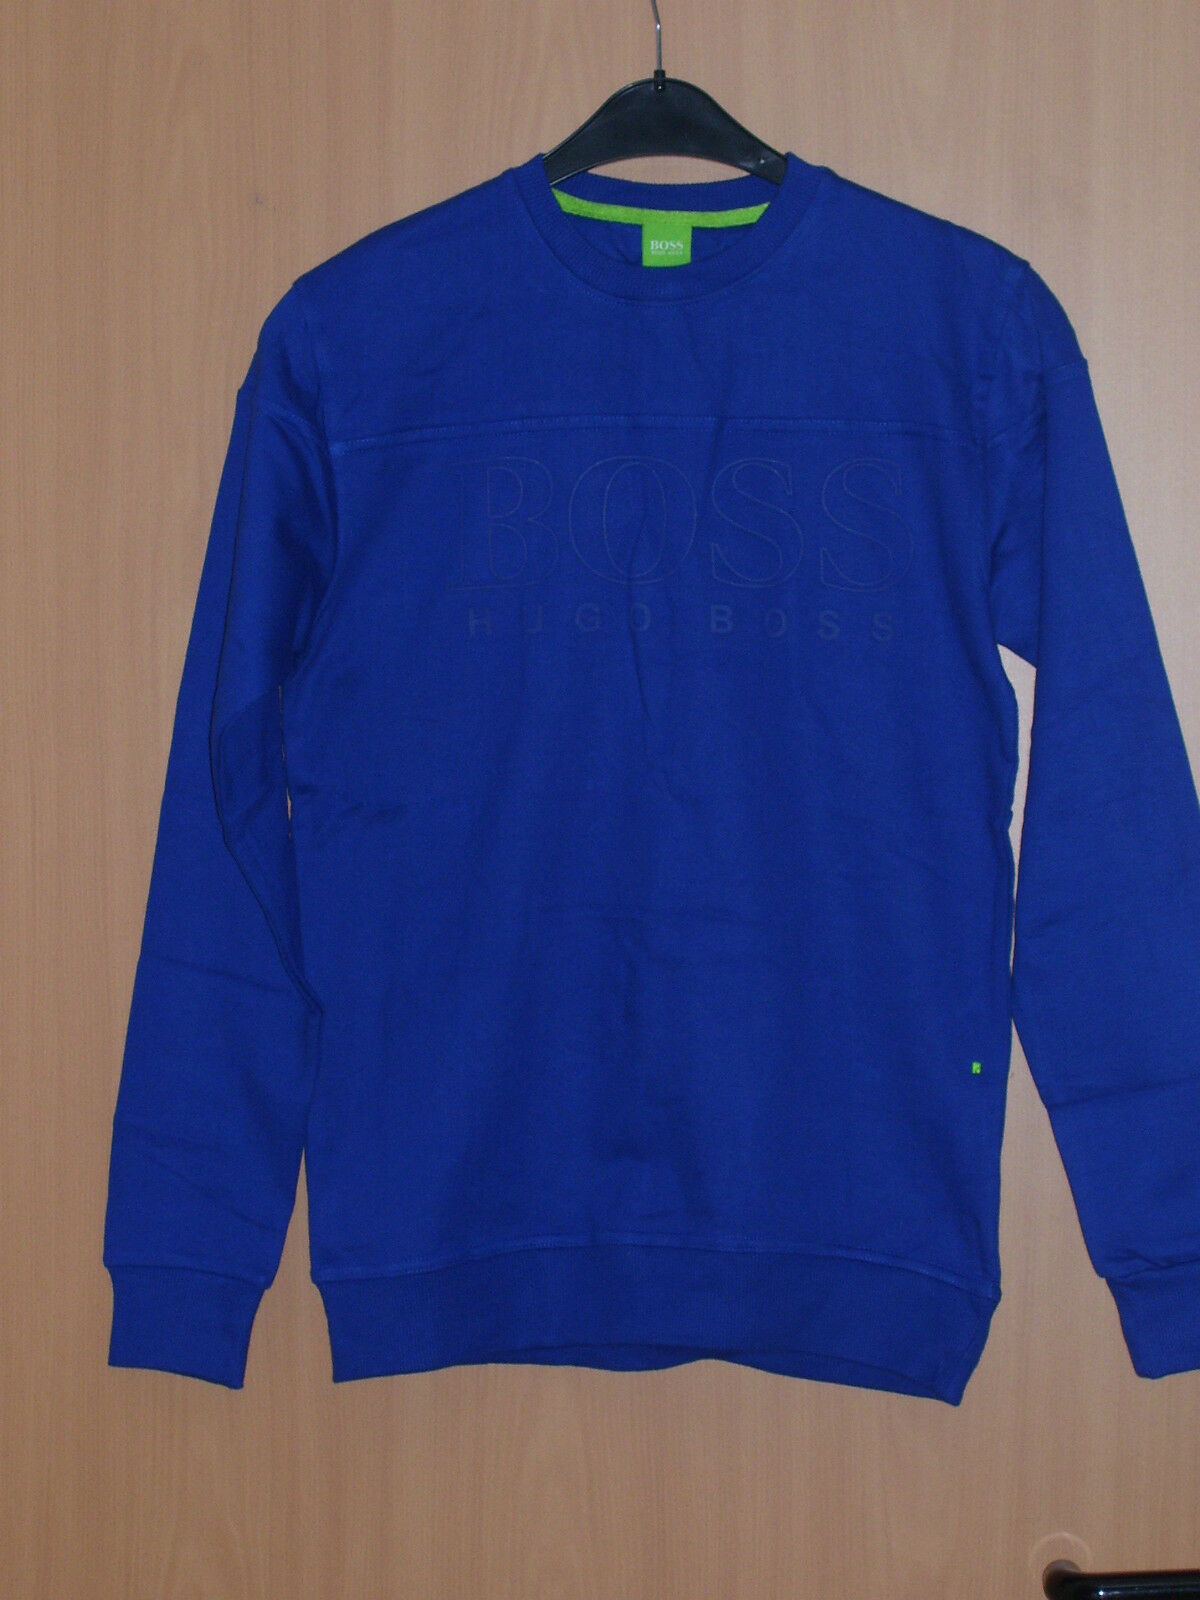 Hugo Boss Grün Label Sweatshirt Rundhals blau royalblau Langarm S M L neu